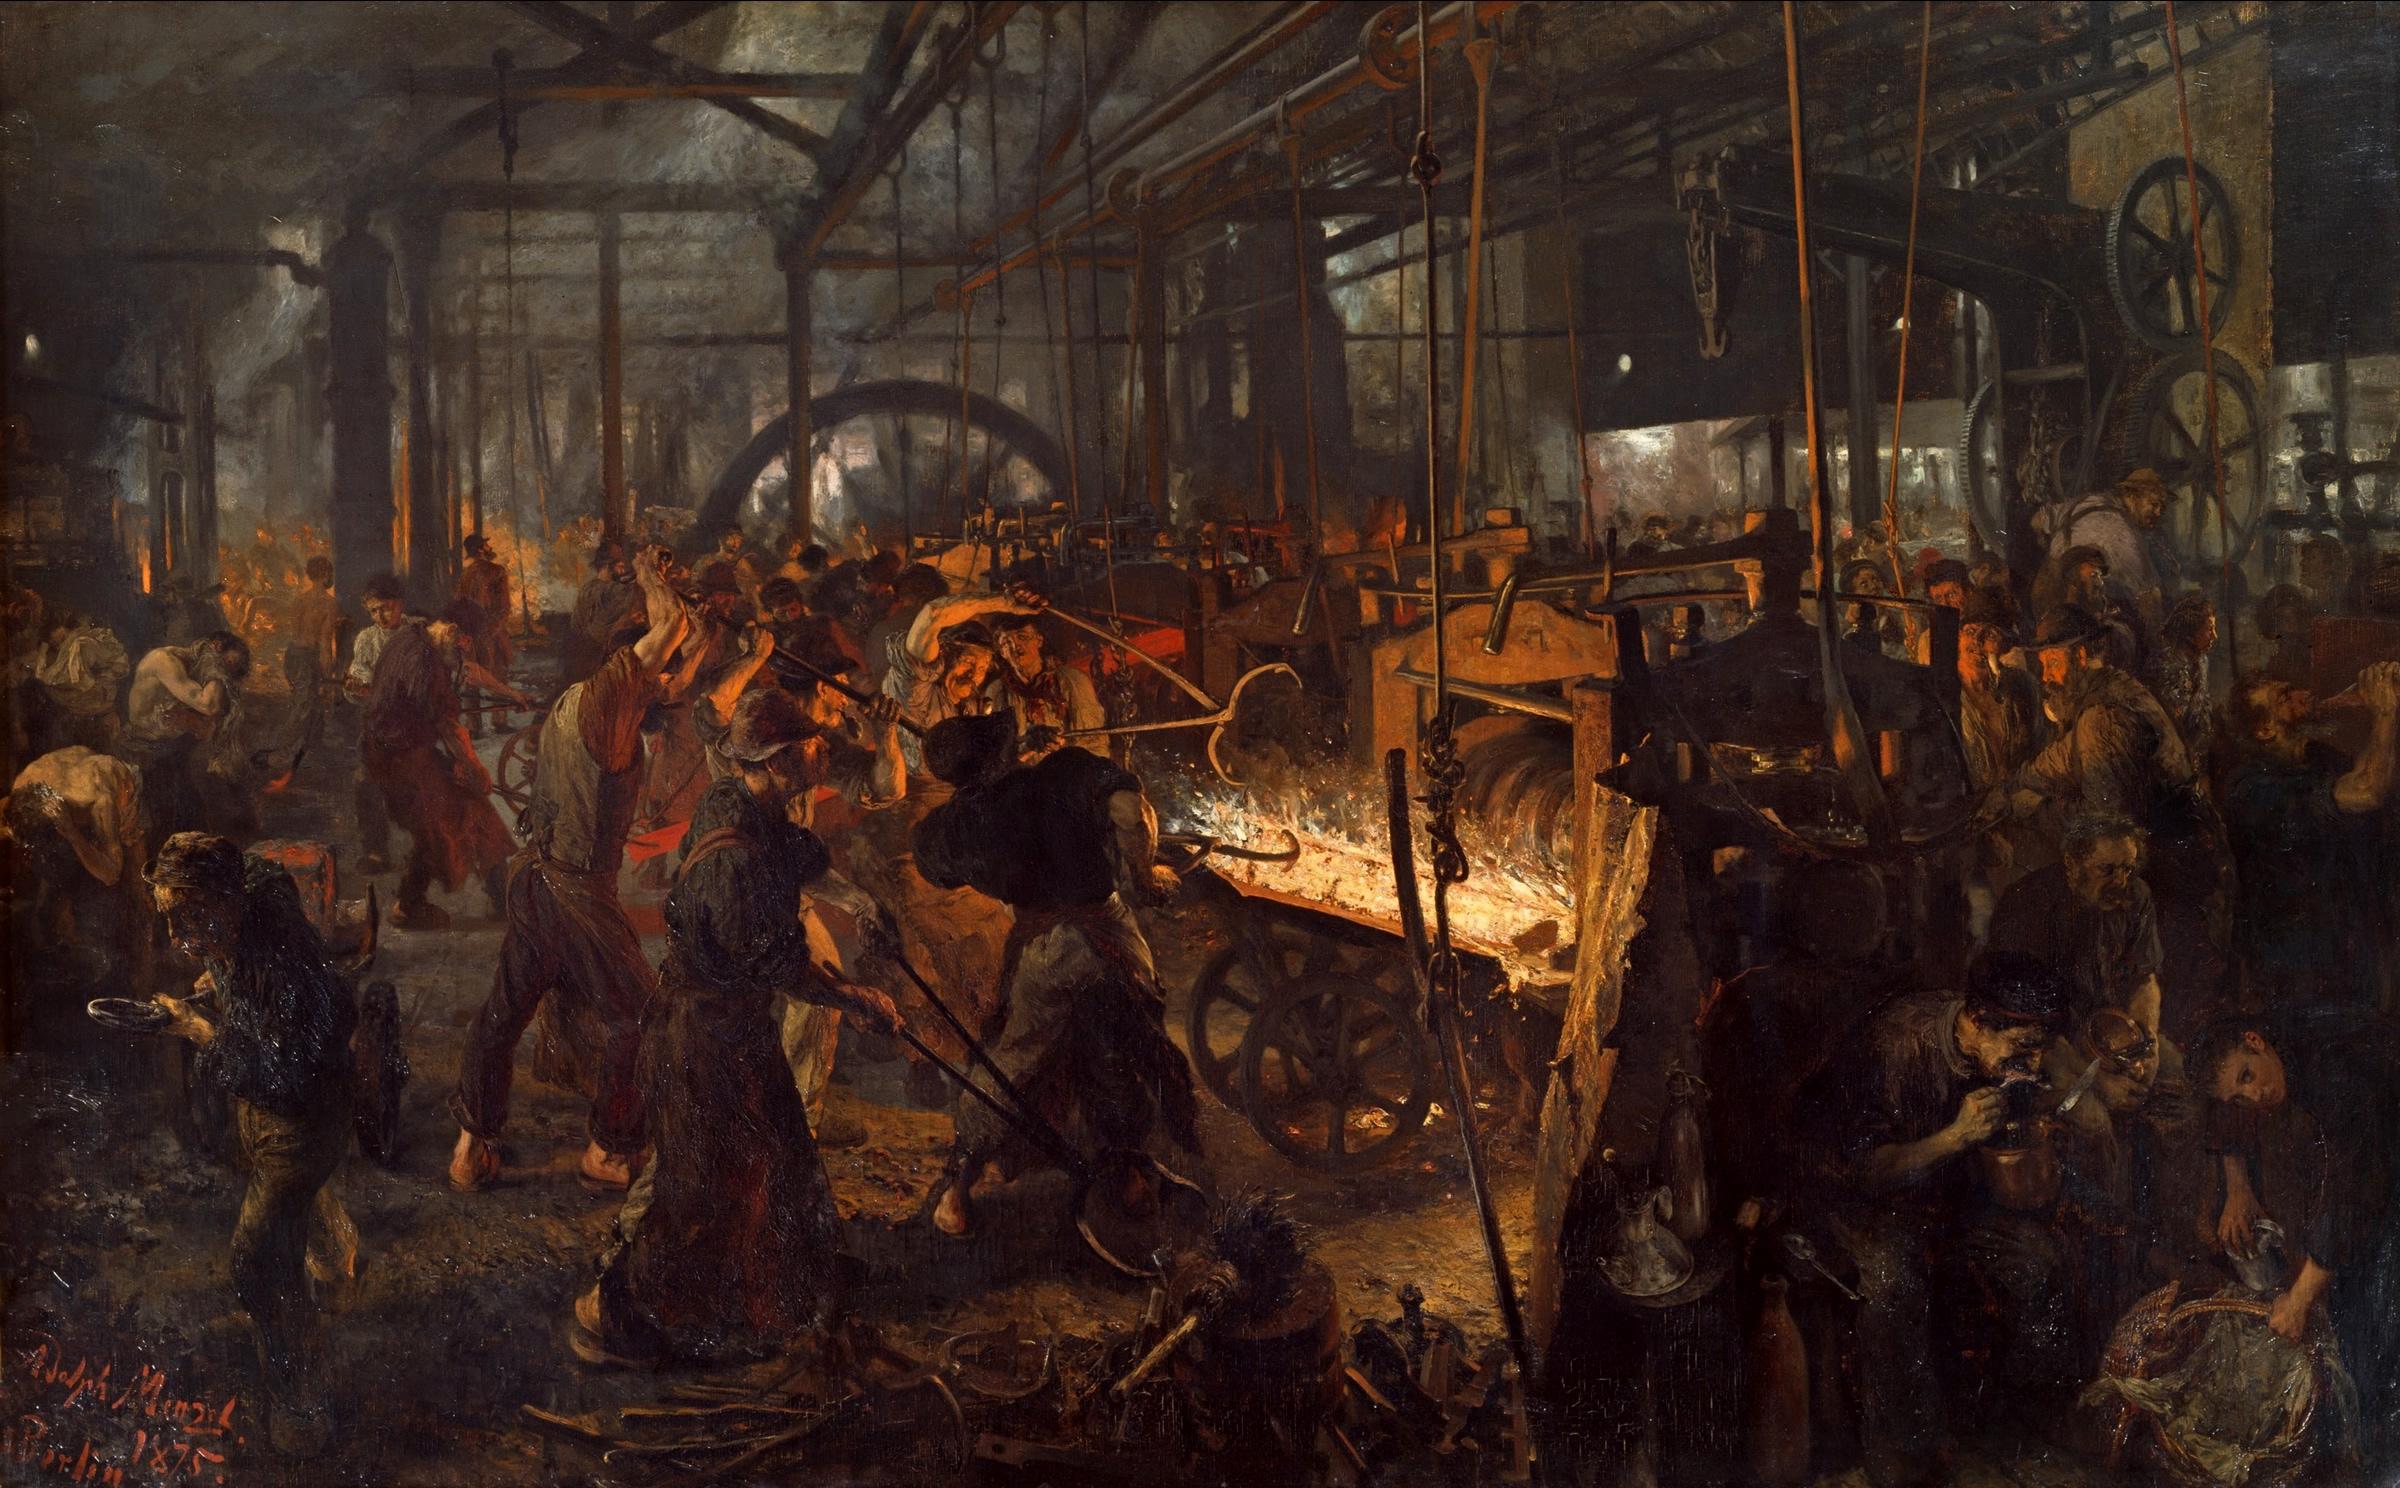 Industrial_revolution-a5aeb5db49481cf7c48223f6093dcb18-